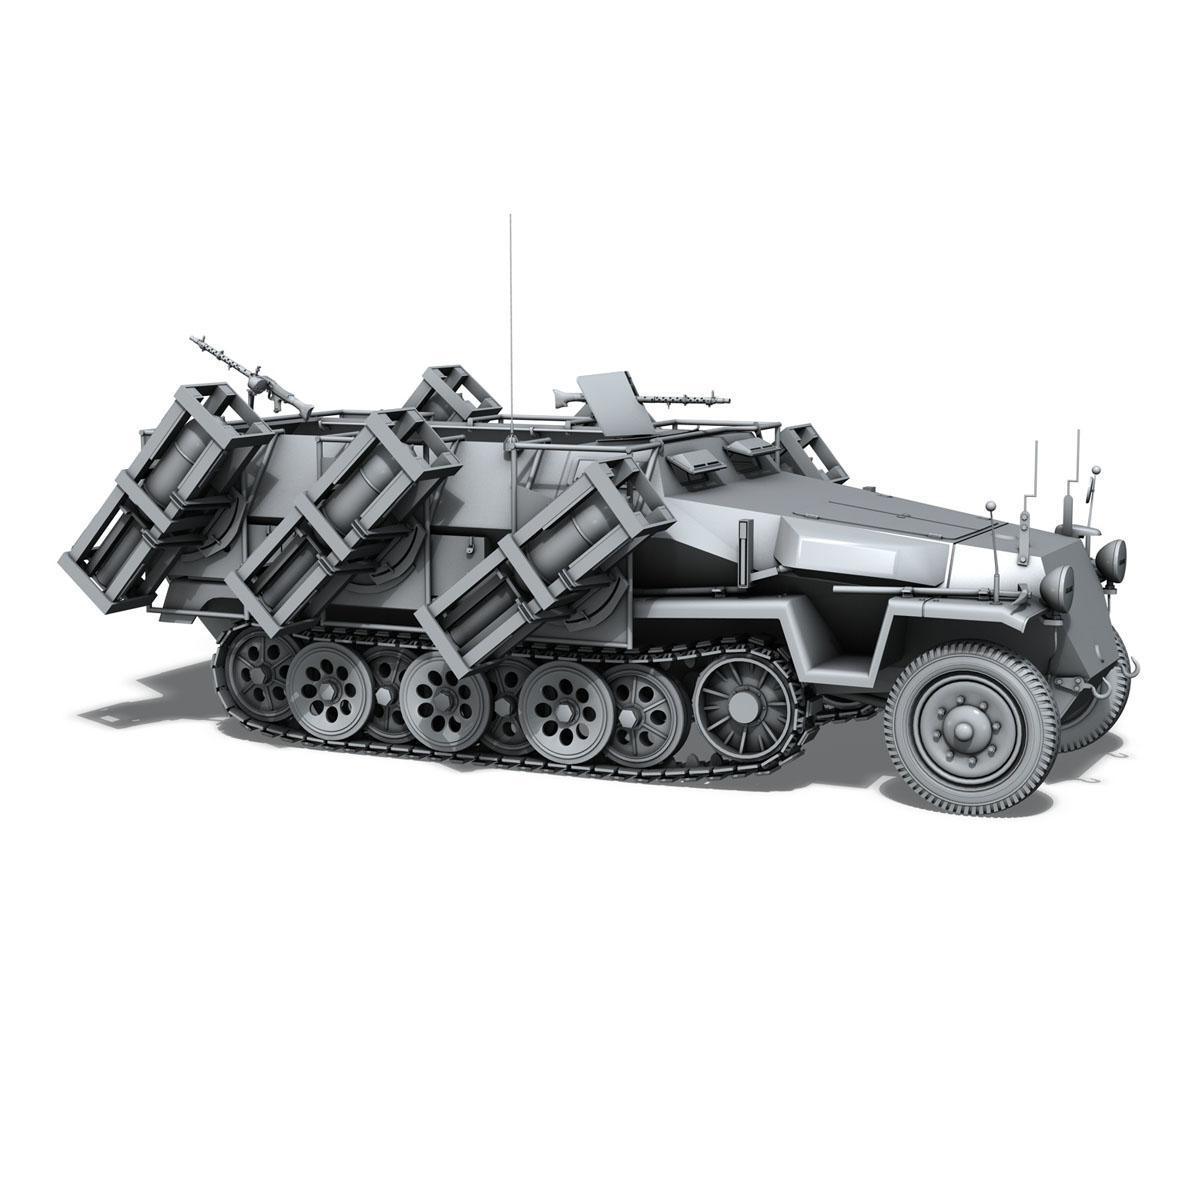 sd.kfz 251/1 ausf.c – walking stuka 3d model 3ds fbx c4d lwo obj 201242